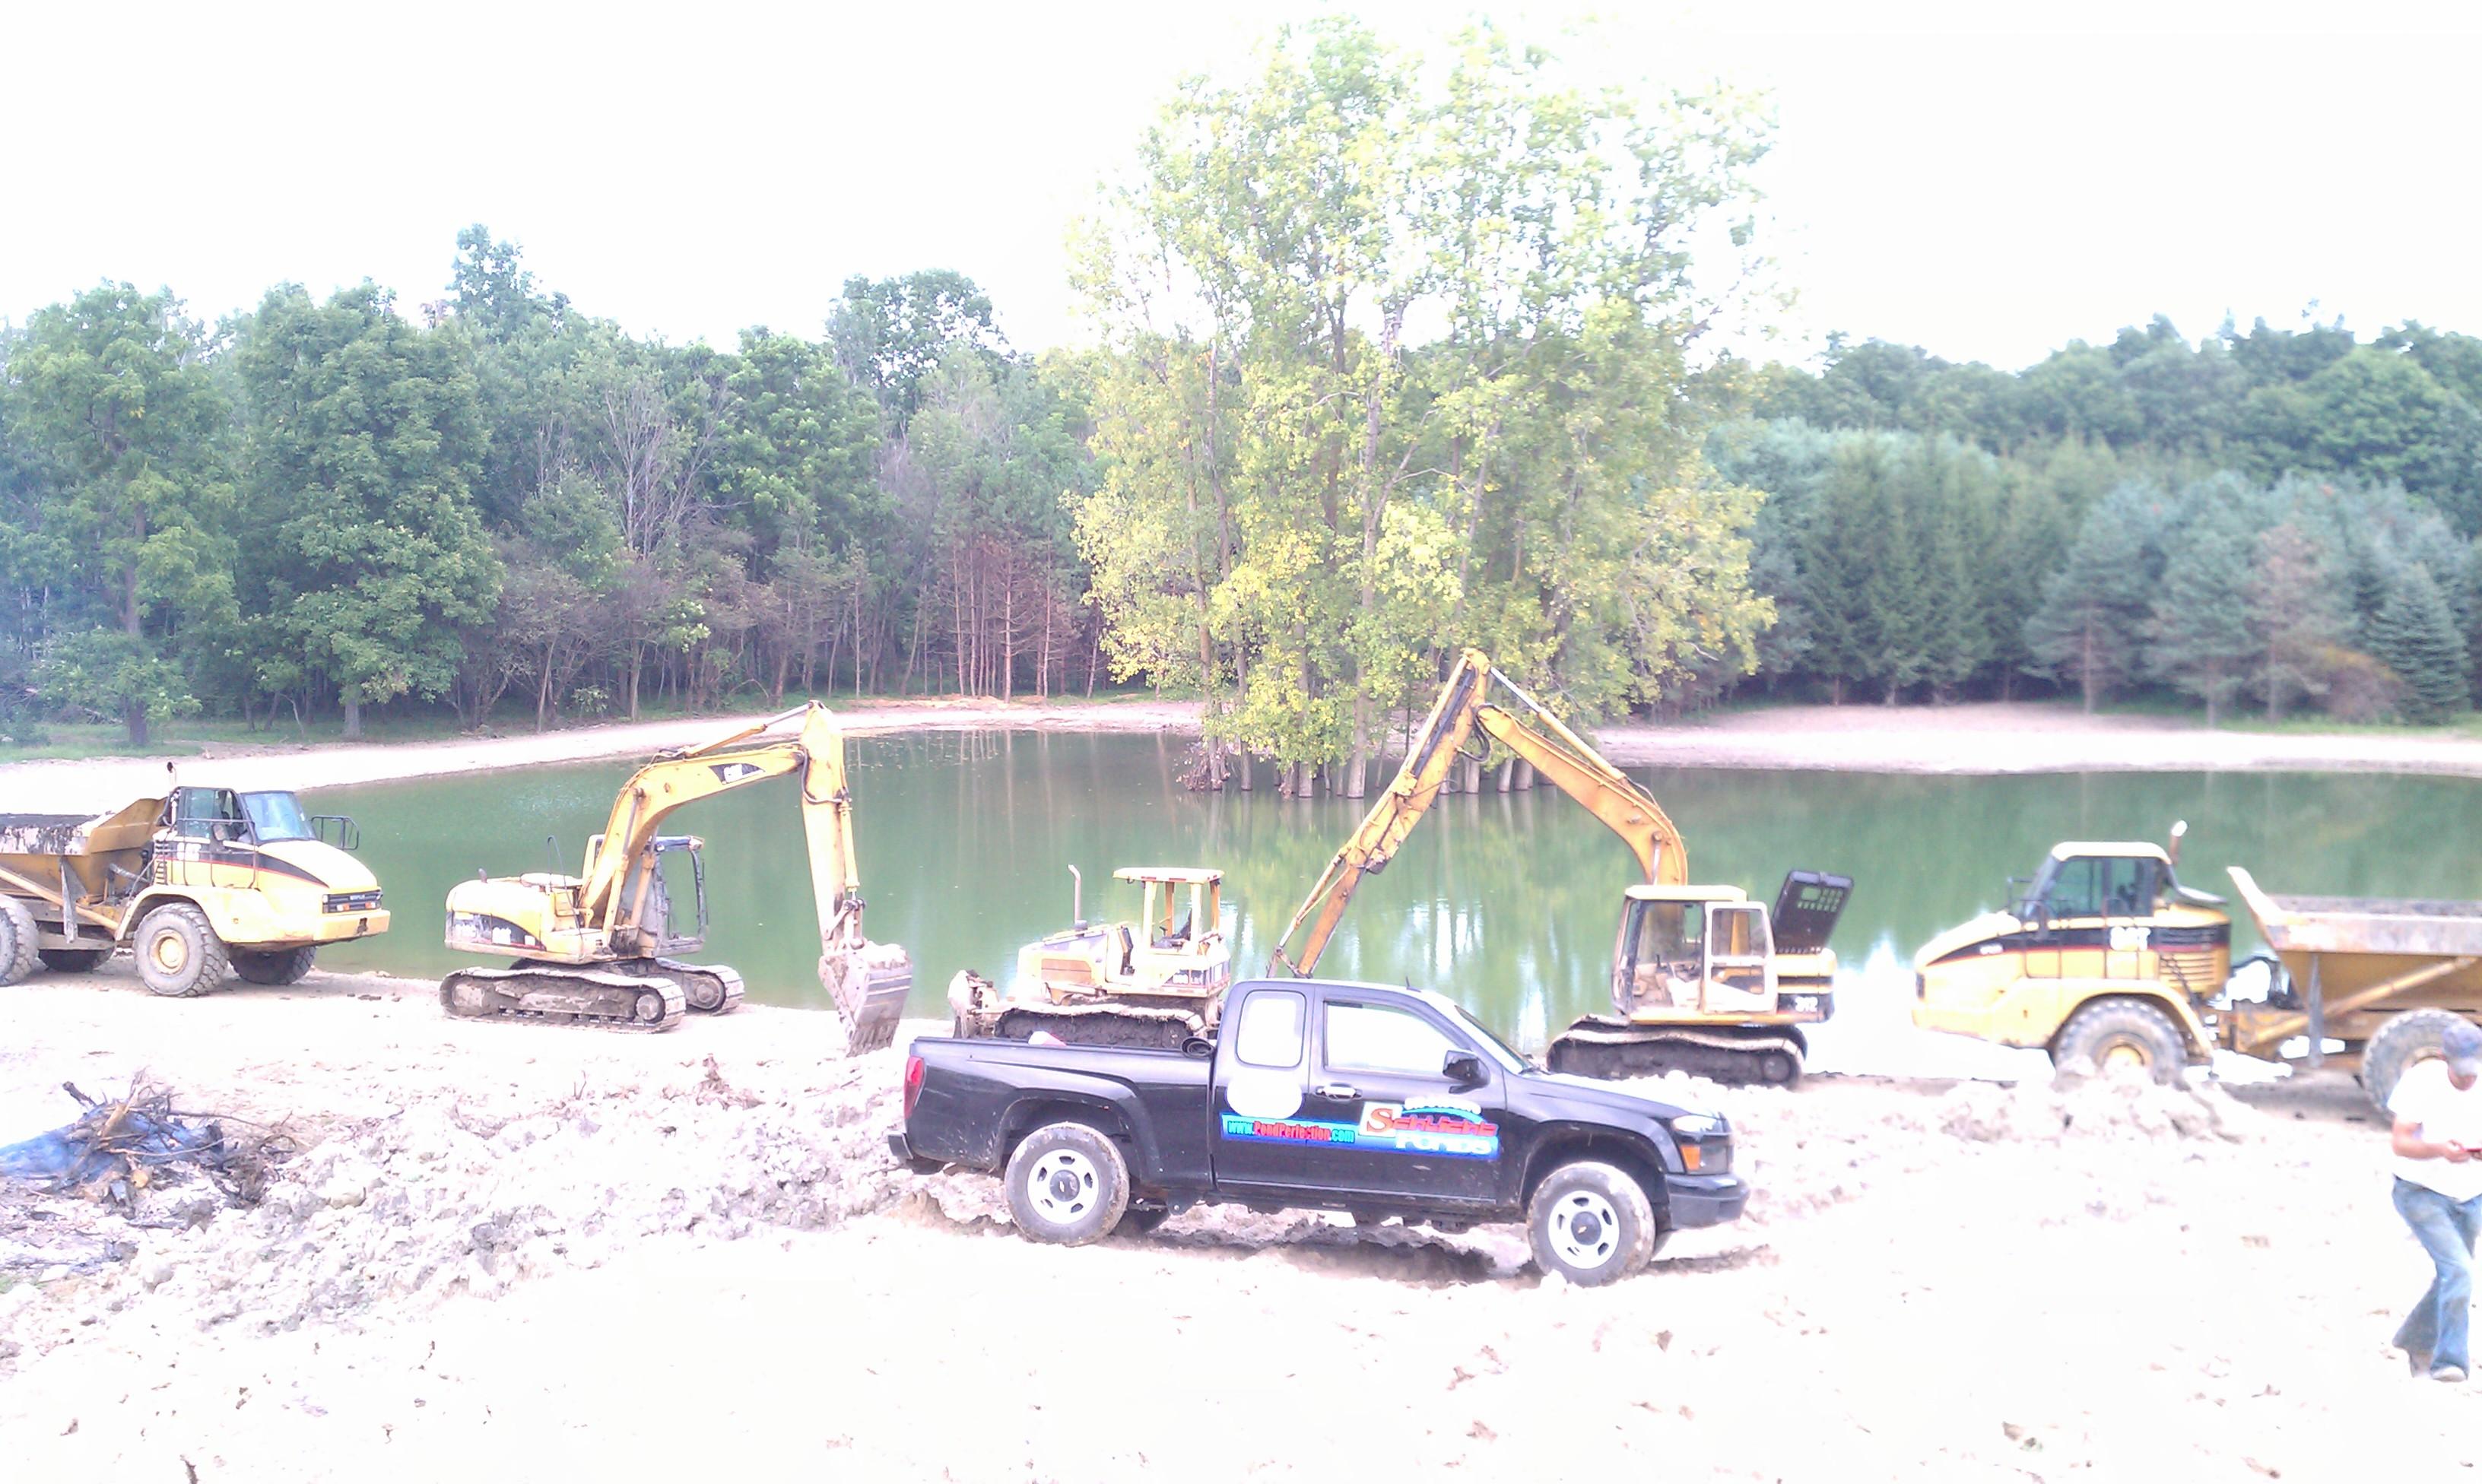 C  Users Scott Pictures ponds a ponds 2011 ann arbor mikee pond 2 Ann Arbor Mikee pond 2  (13)